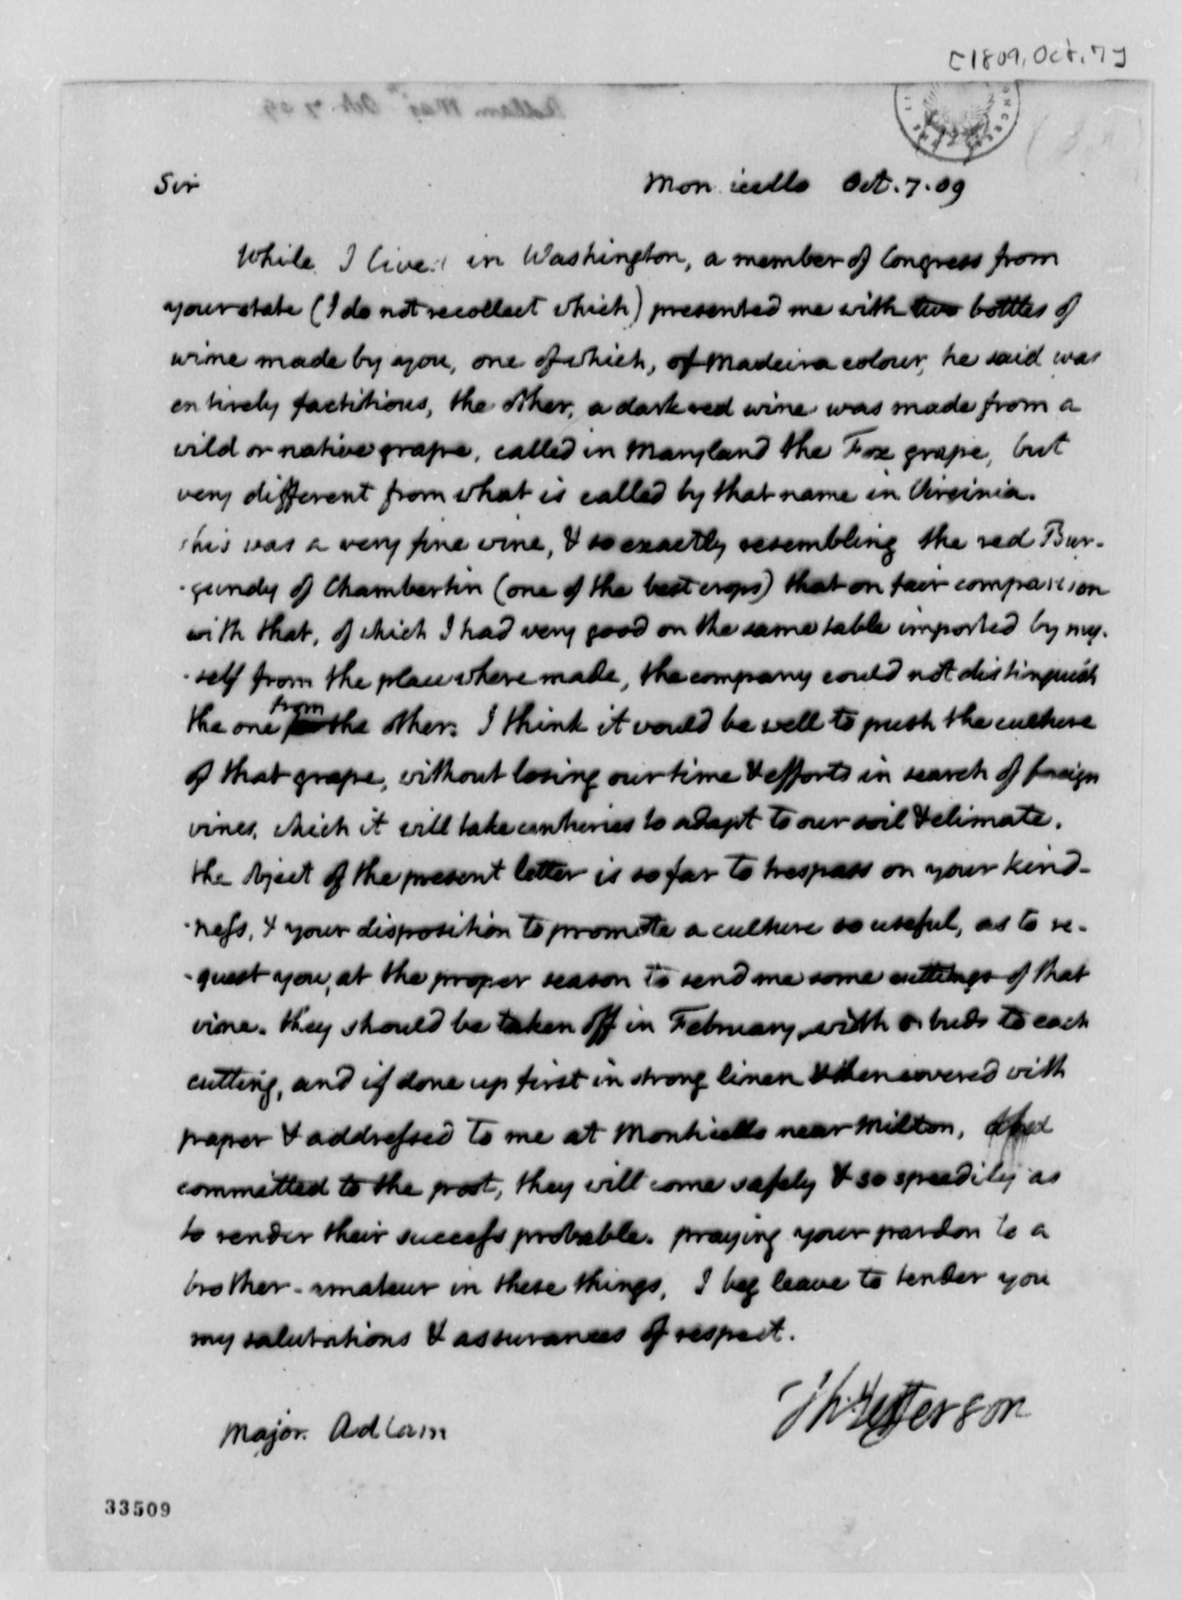 Thomas Jefferson to John Adlum, October 7, 1809